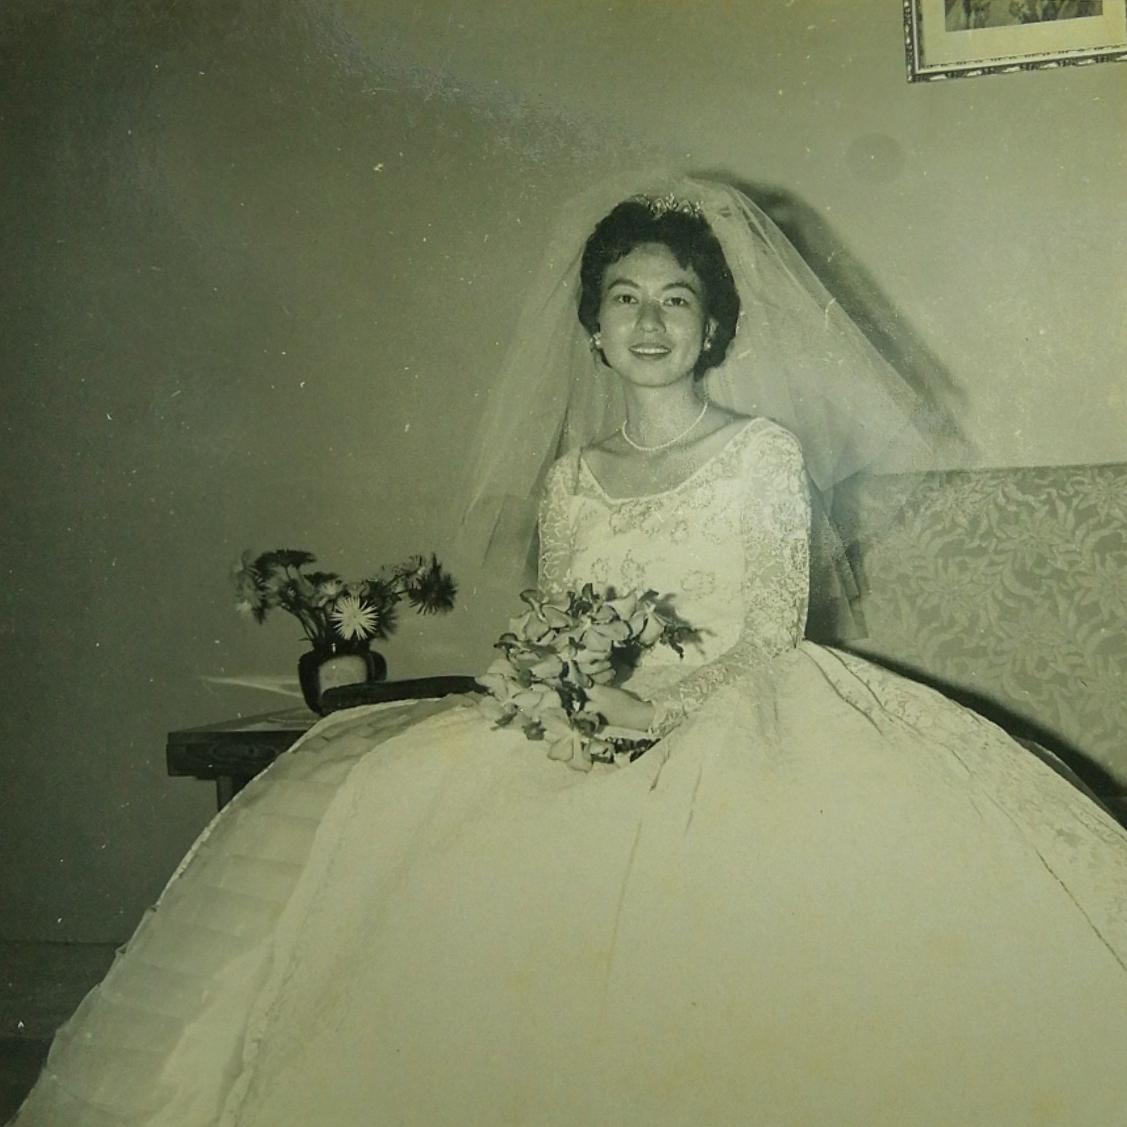 Khim's Wedding Day (2 April 1961)